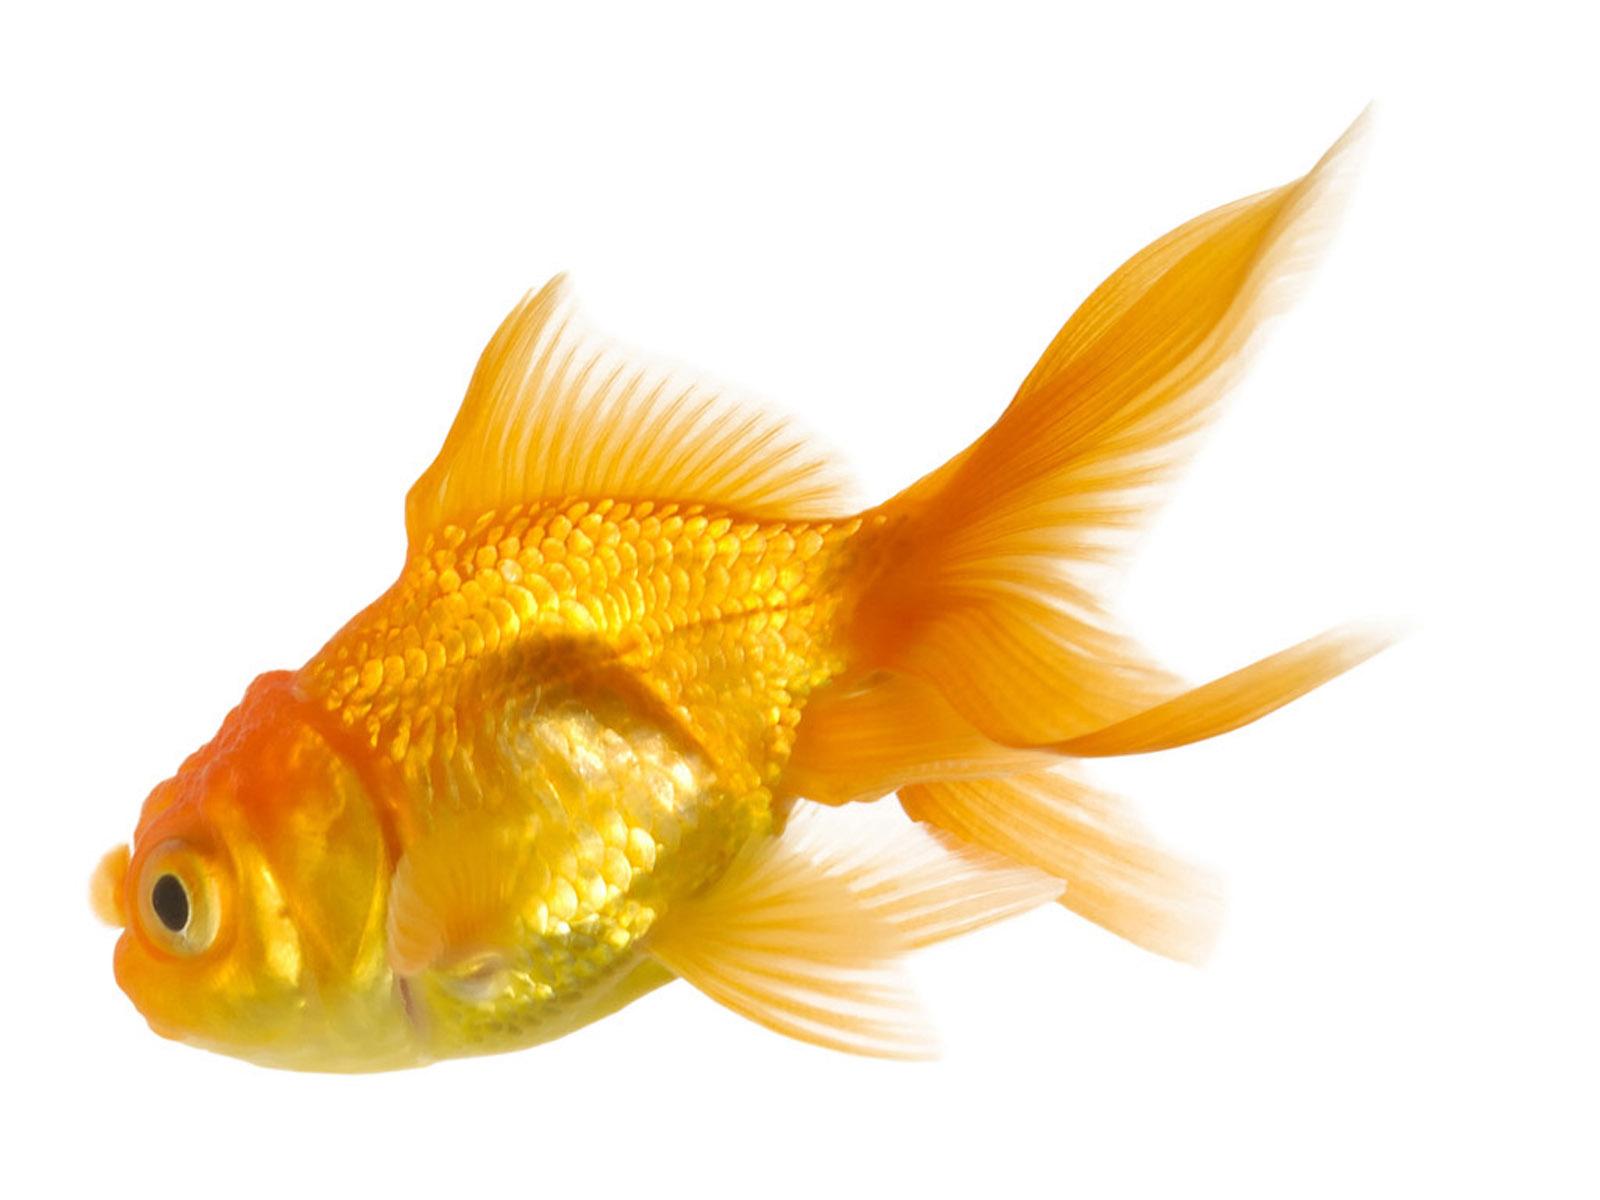 Goldfish Wallpapers 2013 Wallpaper 1600x1200